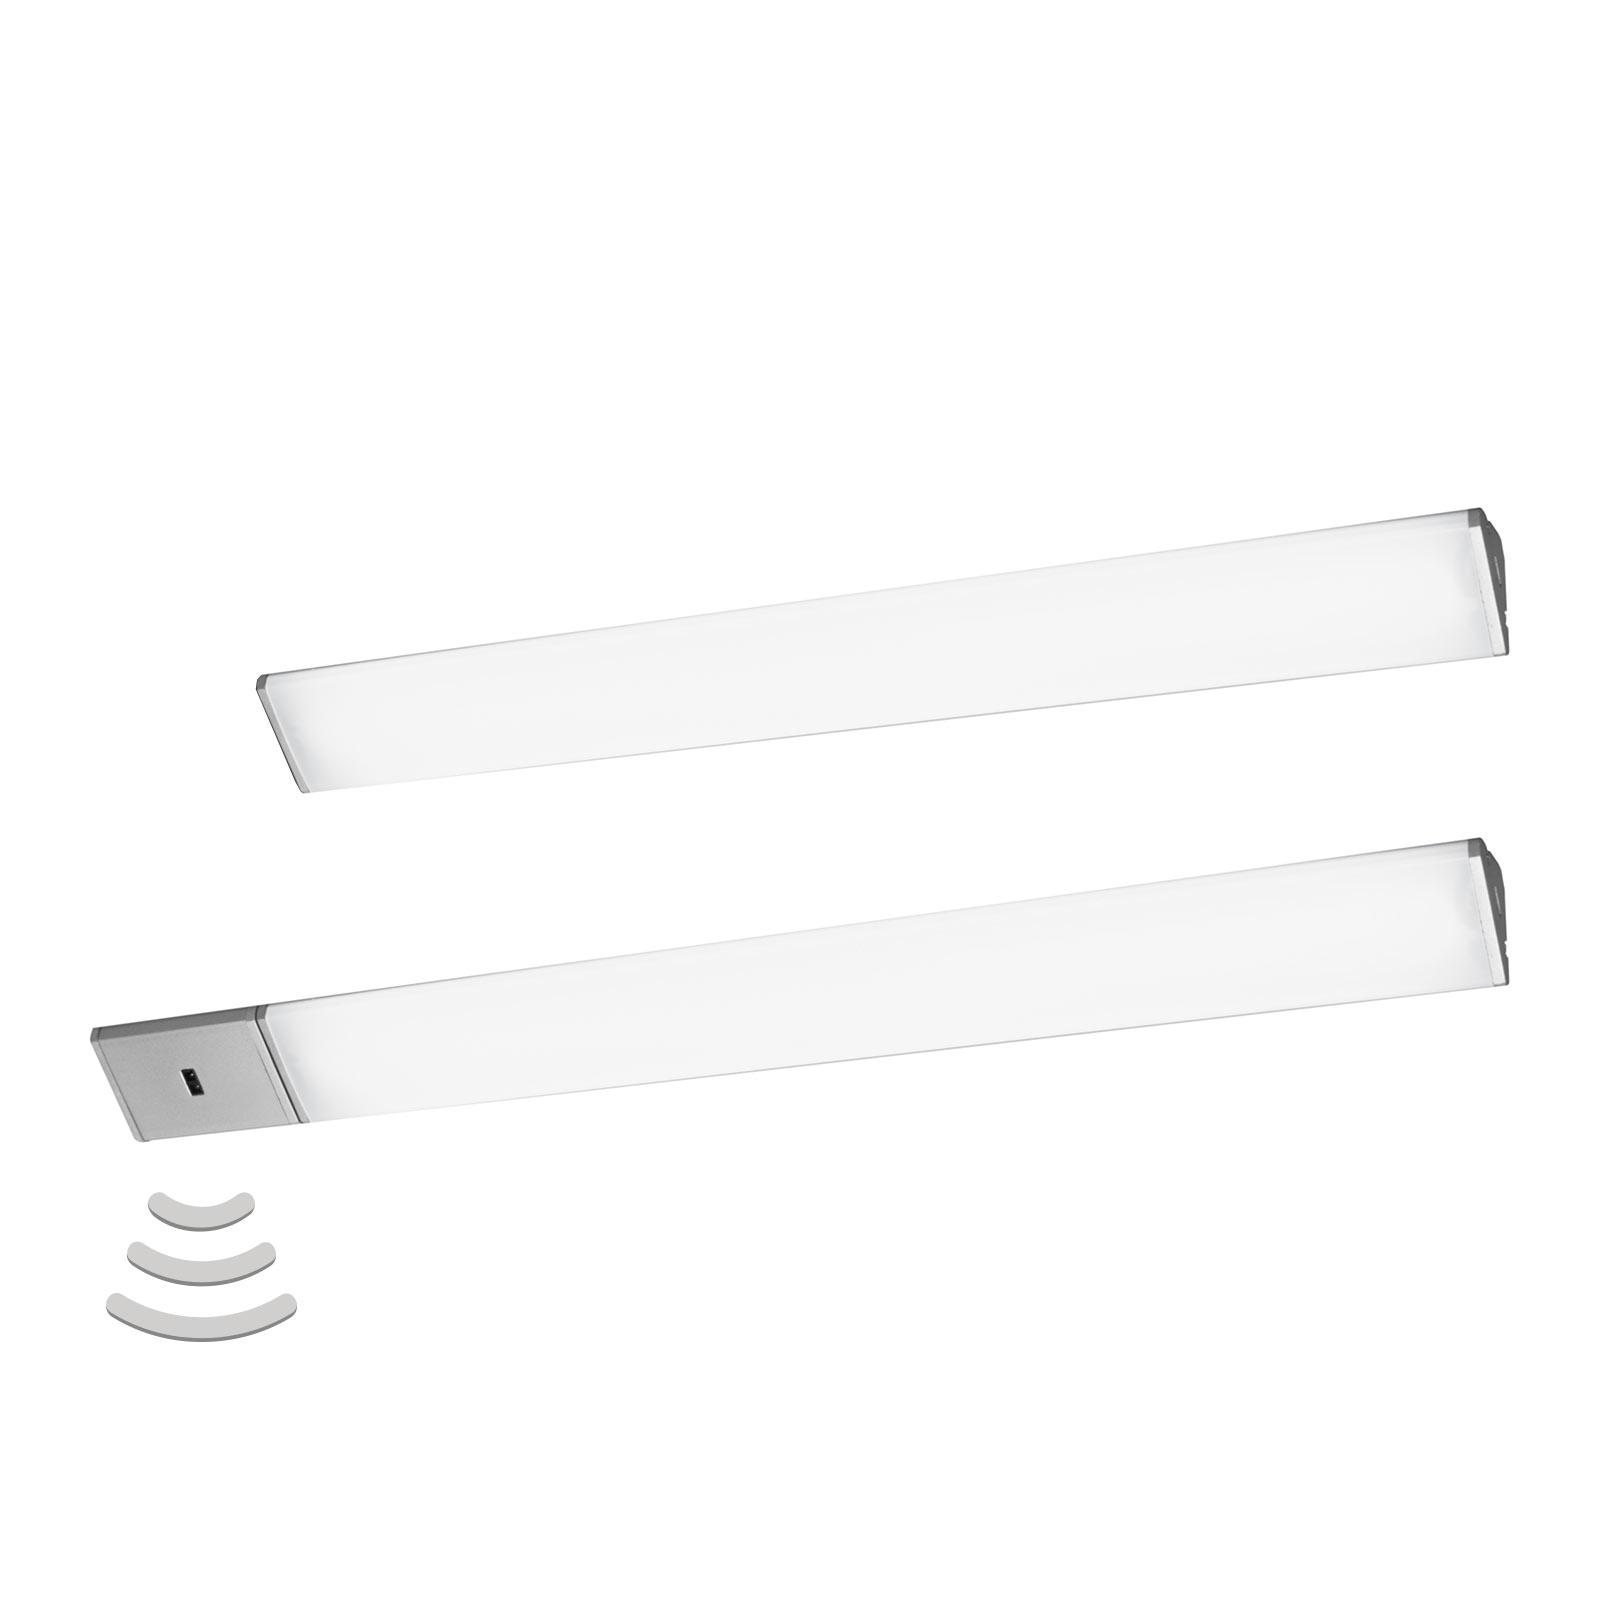 LEDVANCE Cabinet Corner under-cabinet lamp 35cm 2x_6106103_1